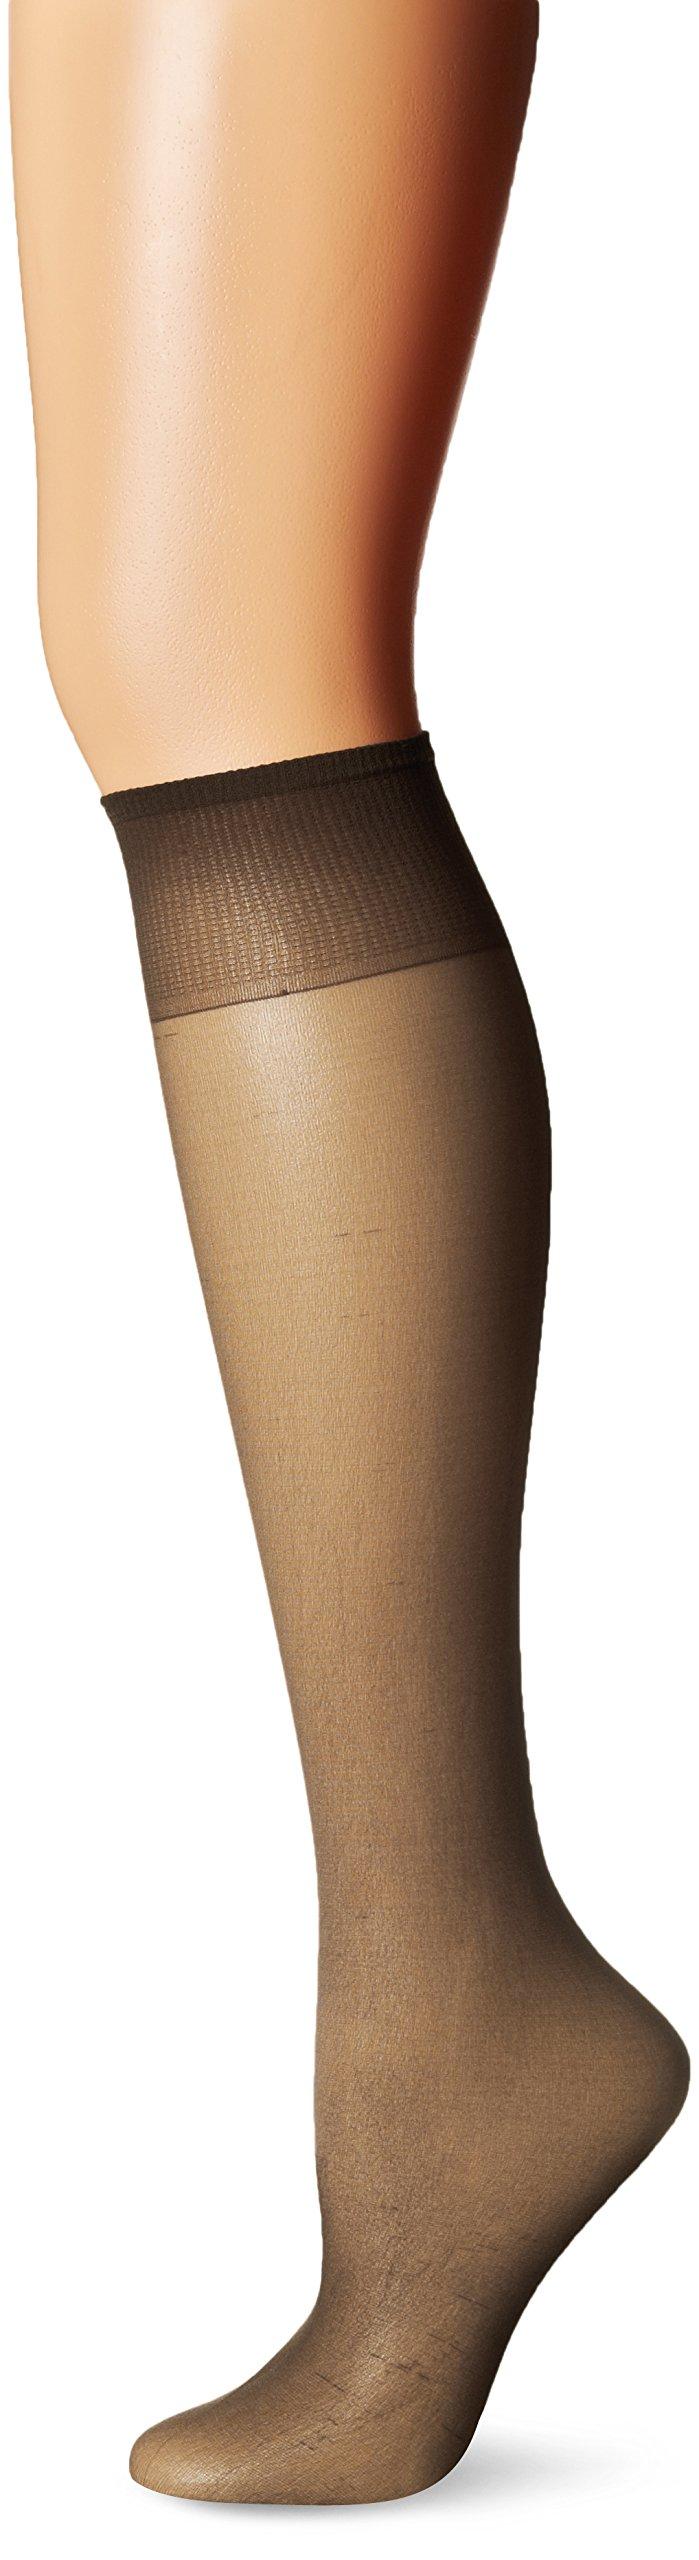 L'eggs Women's Brown Sugar Knee High Sheer Toe Panty Hose, Off Black, One Size